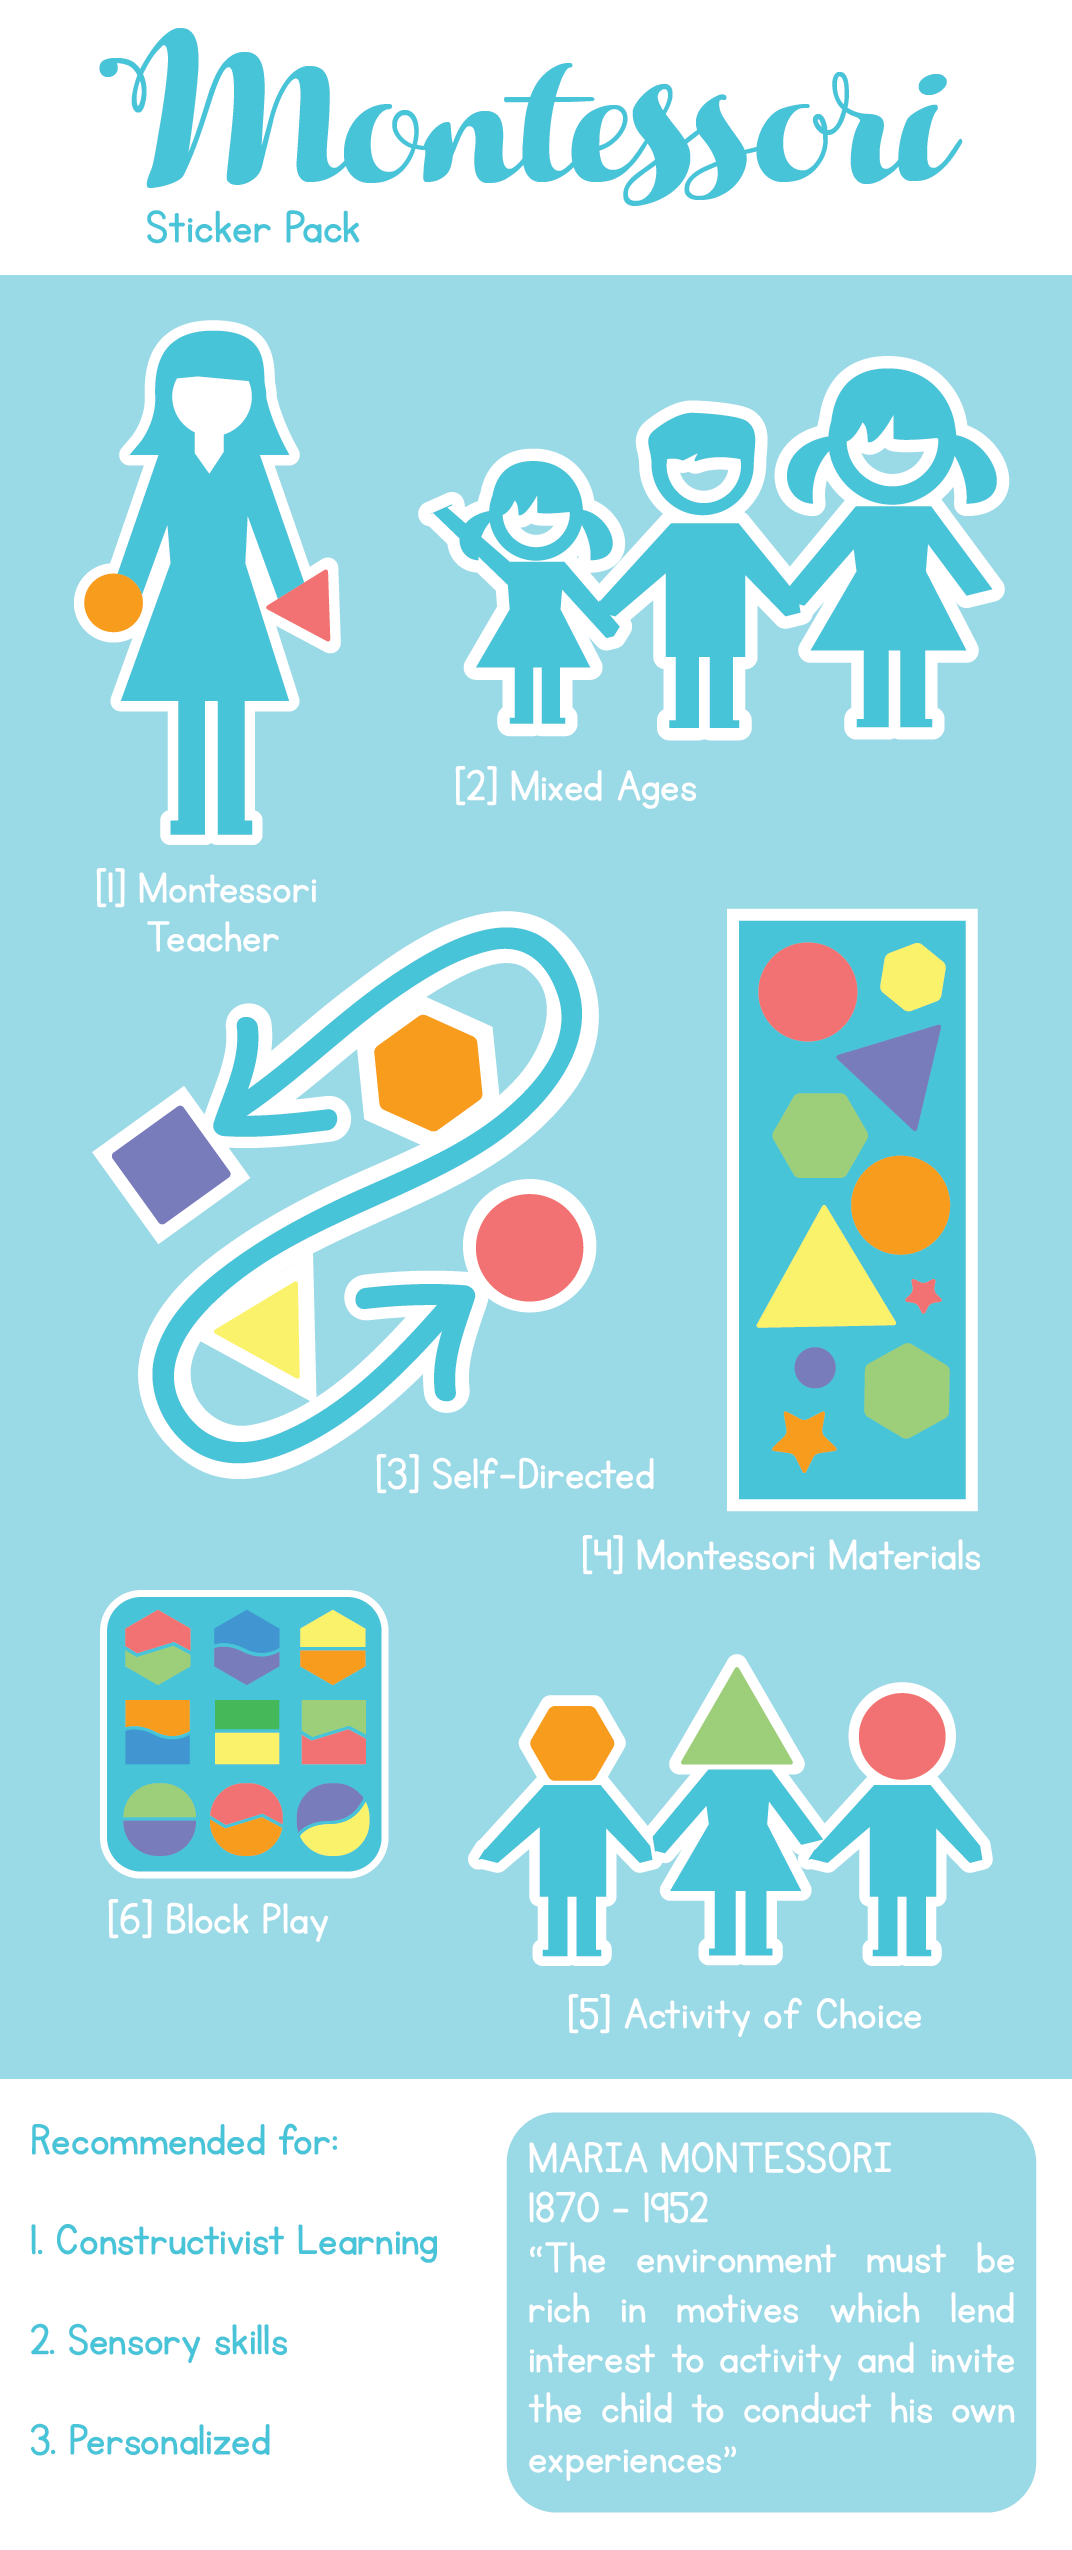 Sticker Pack_Montessori.png